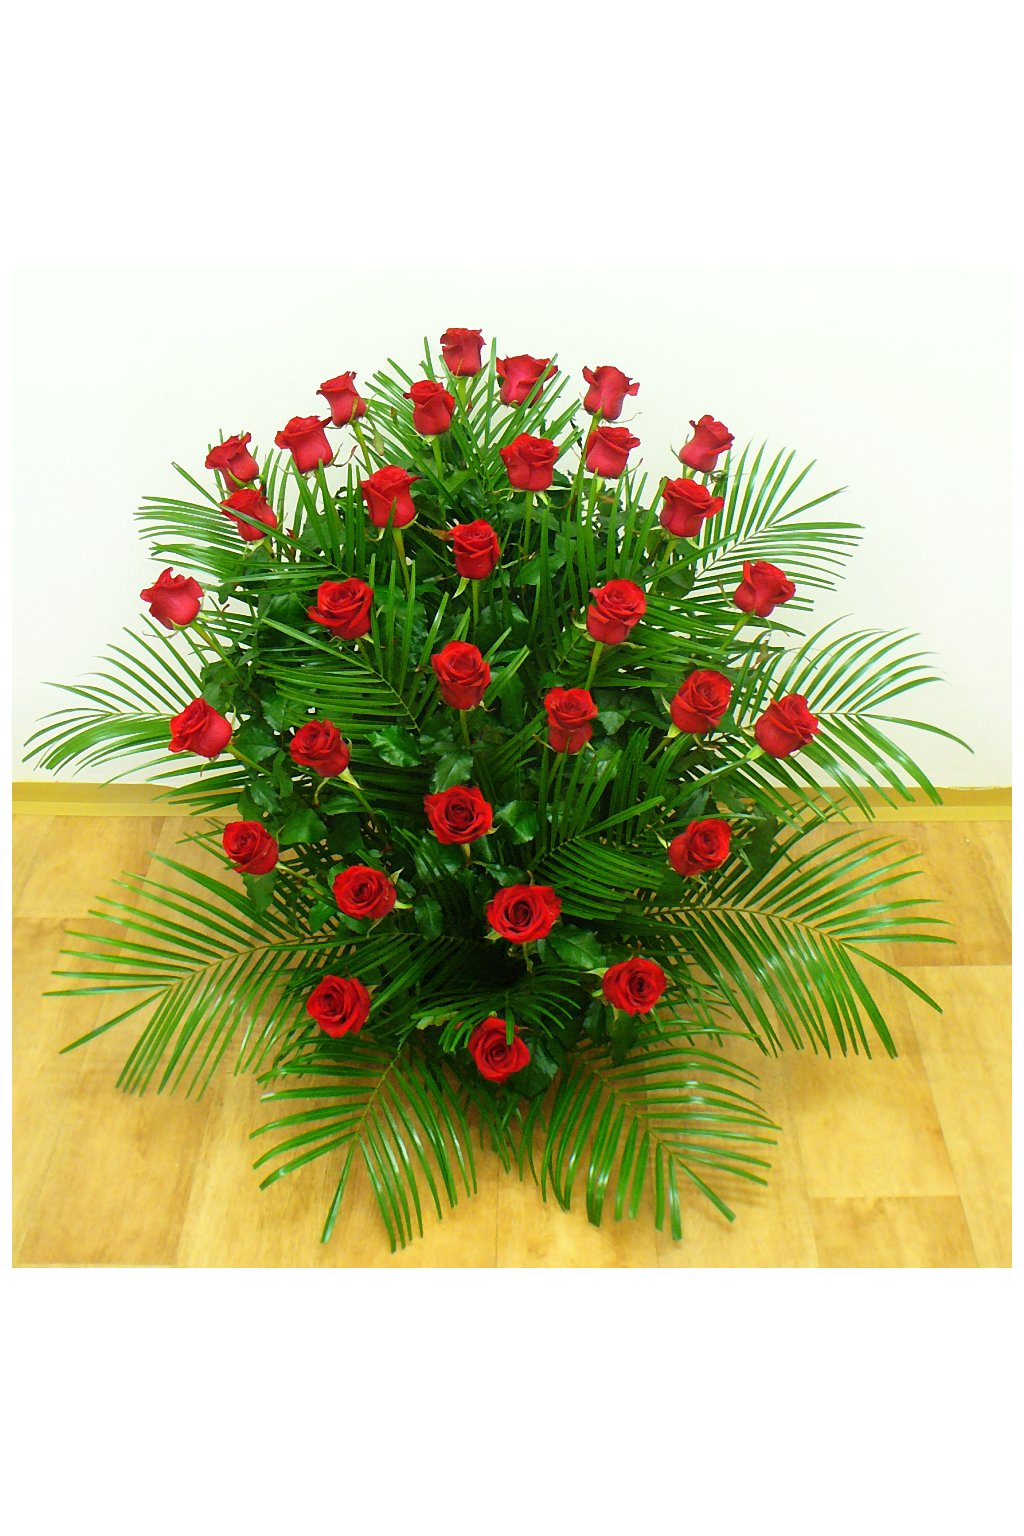 smutecni kytice rude ruze kvetiny kvetinarstvi arnapi